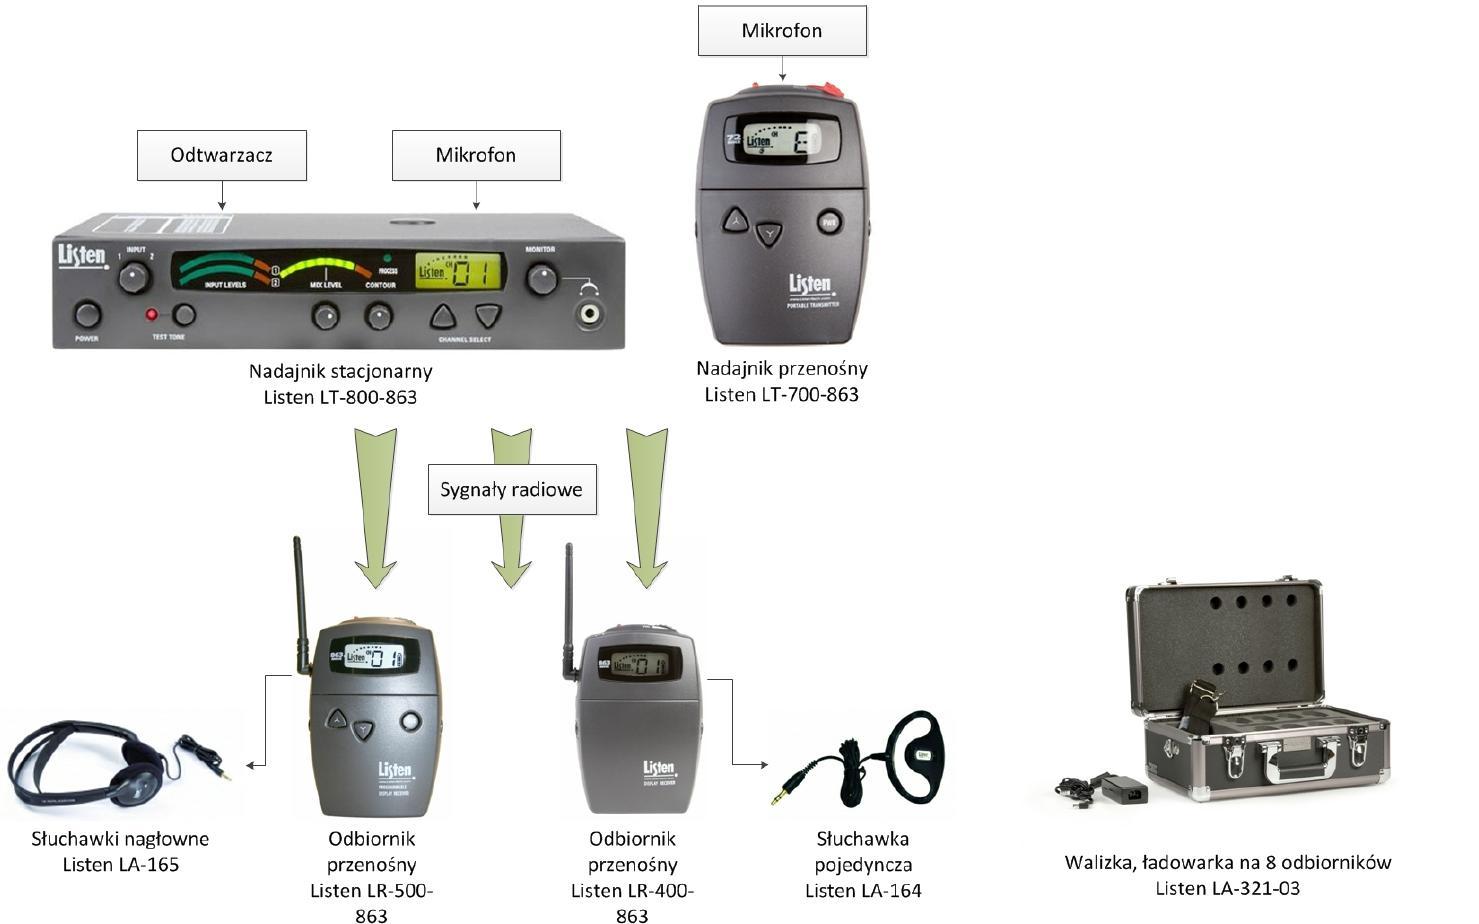 Radiowy%20system%20transmisji%20d%C5%BAw